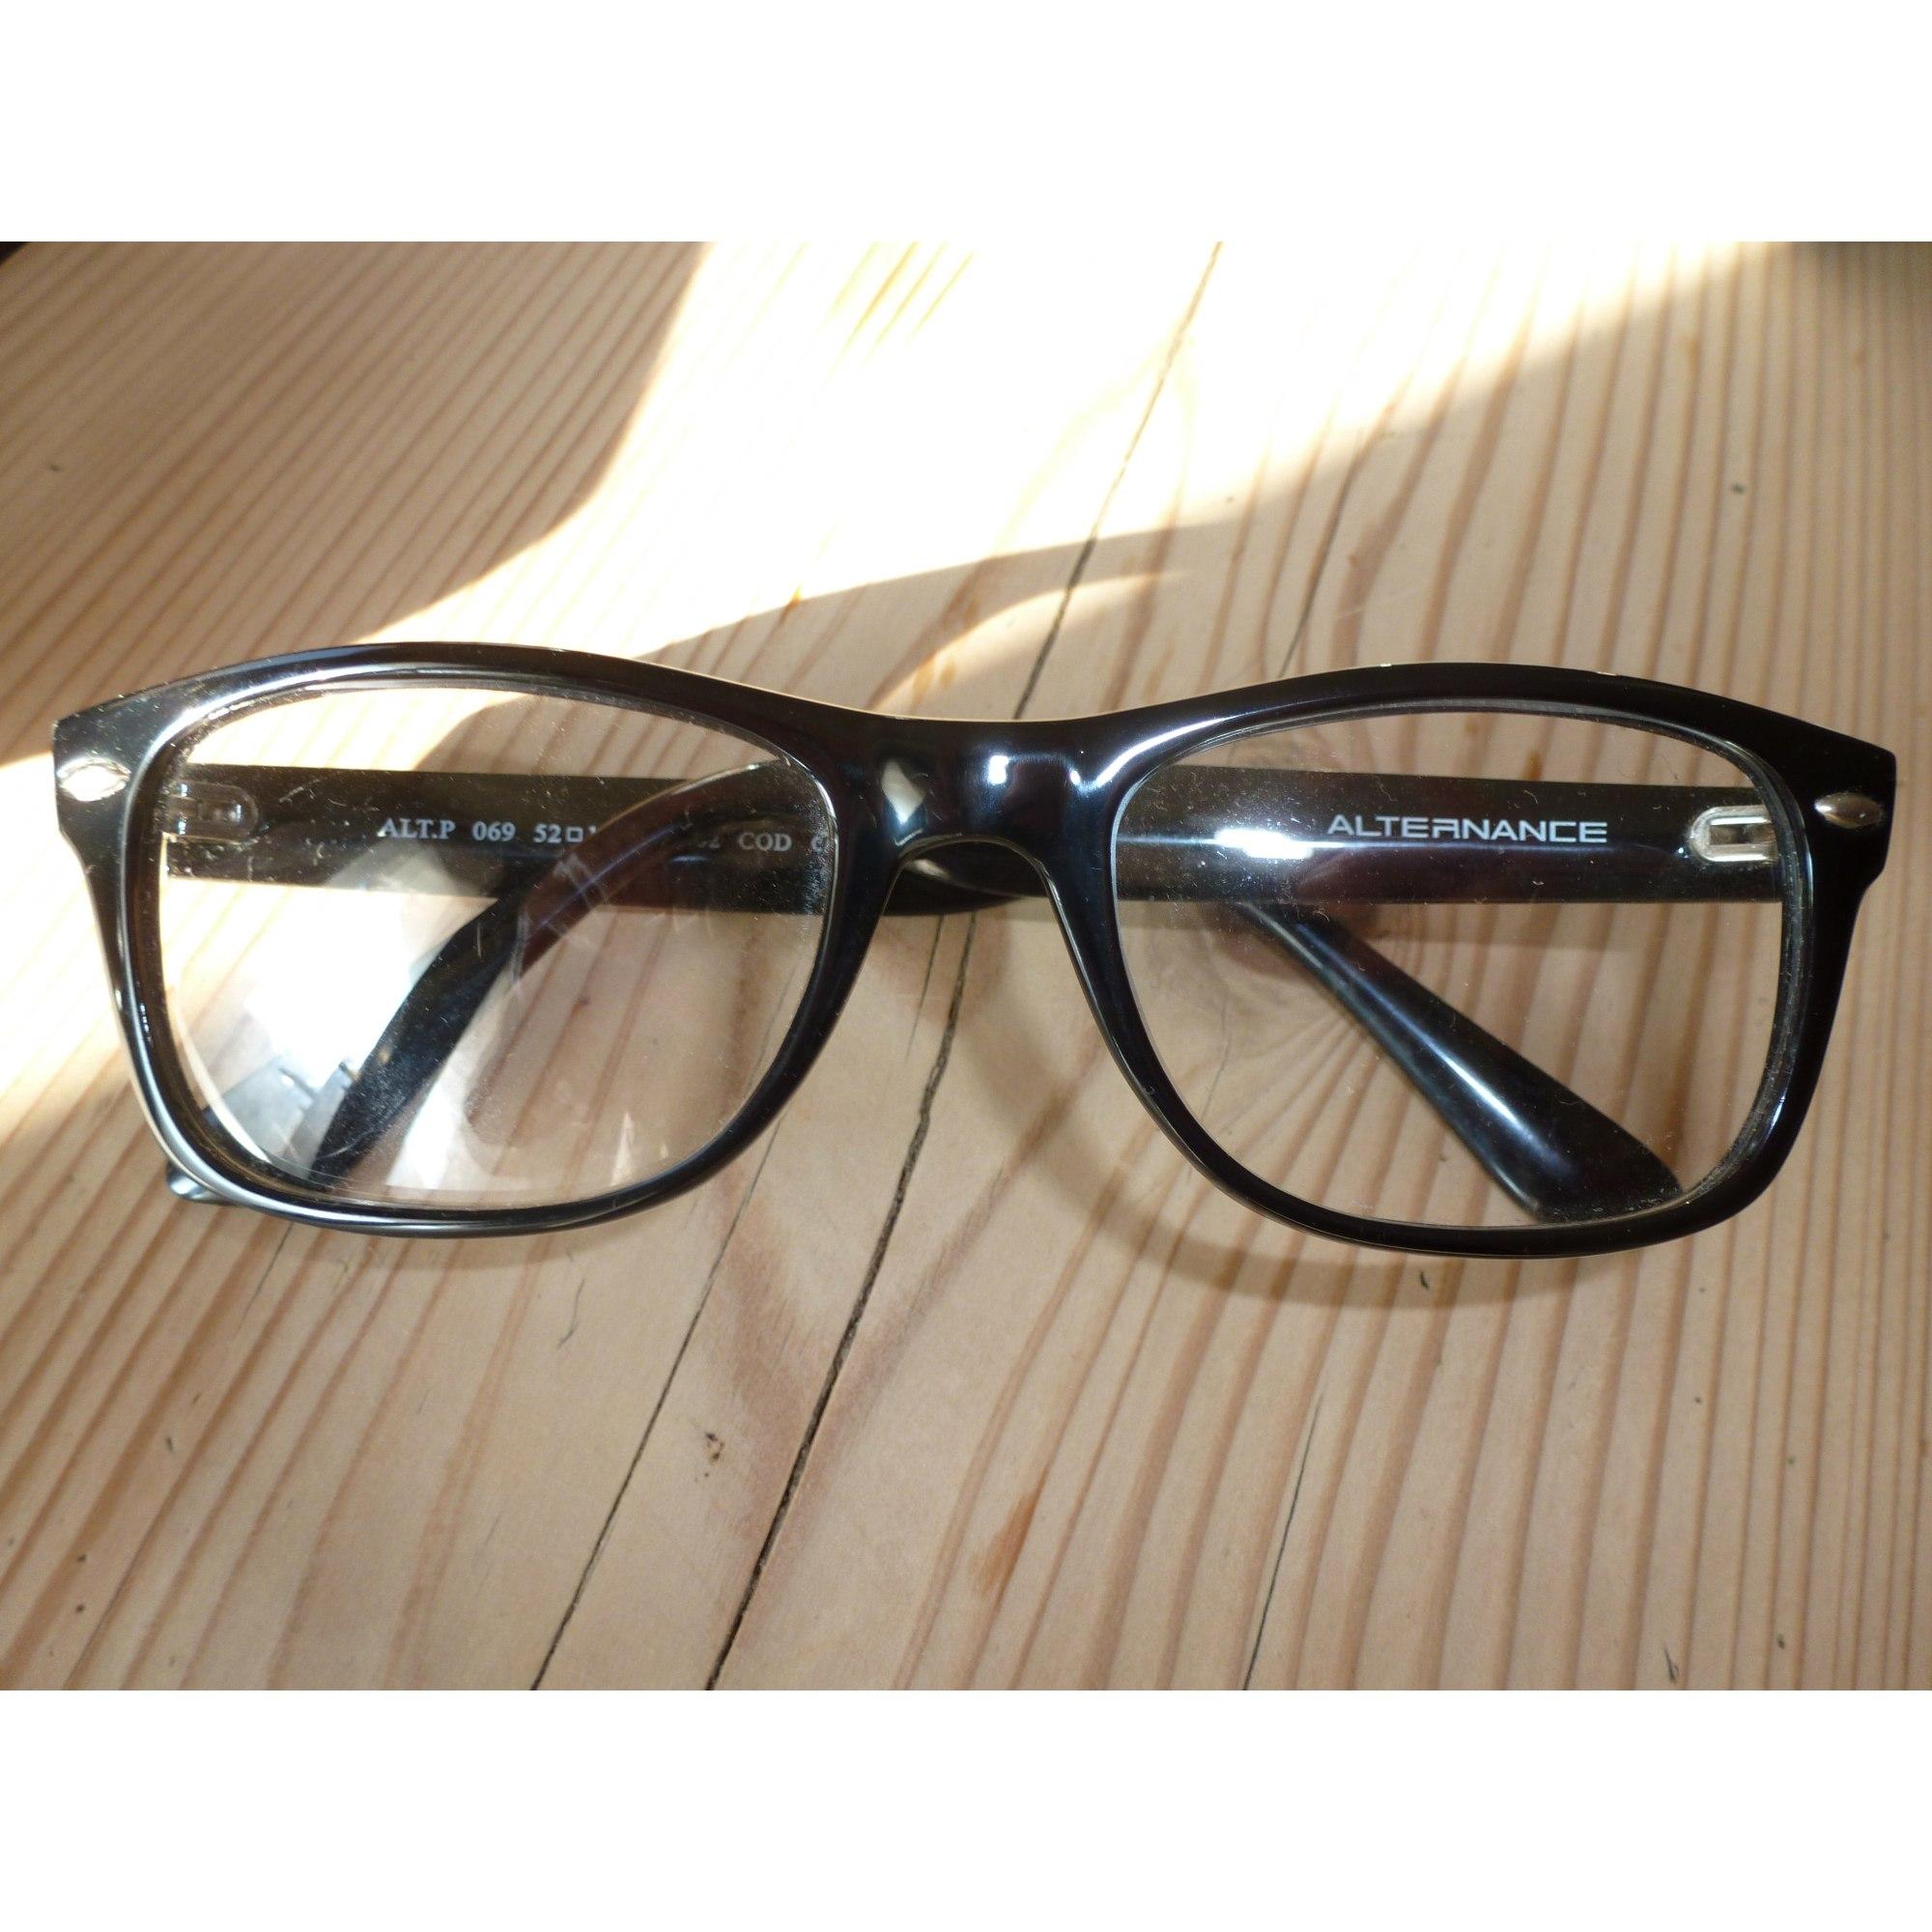 Brillen ALTERNANCE schwarz vendu par Landeve79349 - 4127565